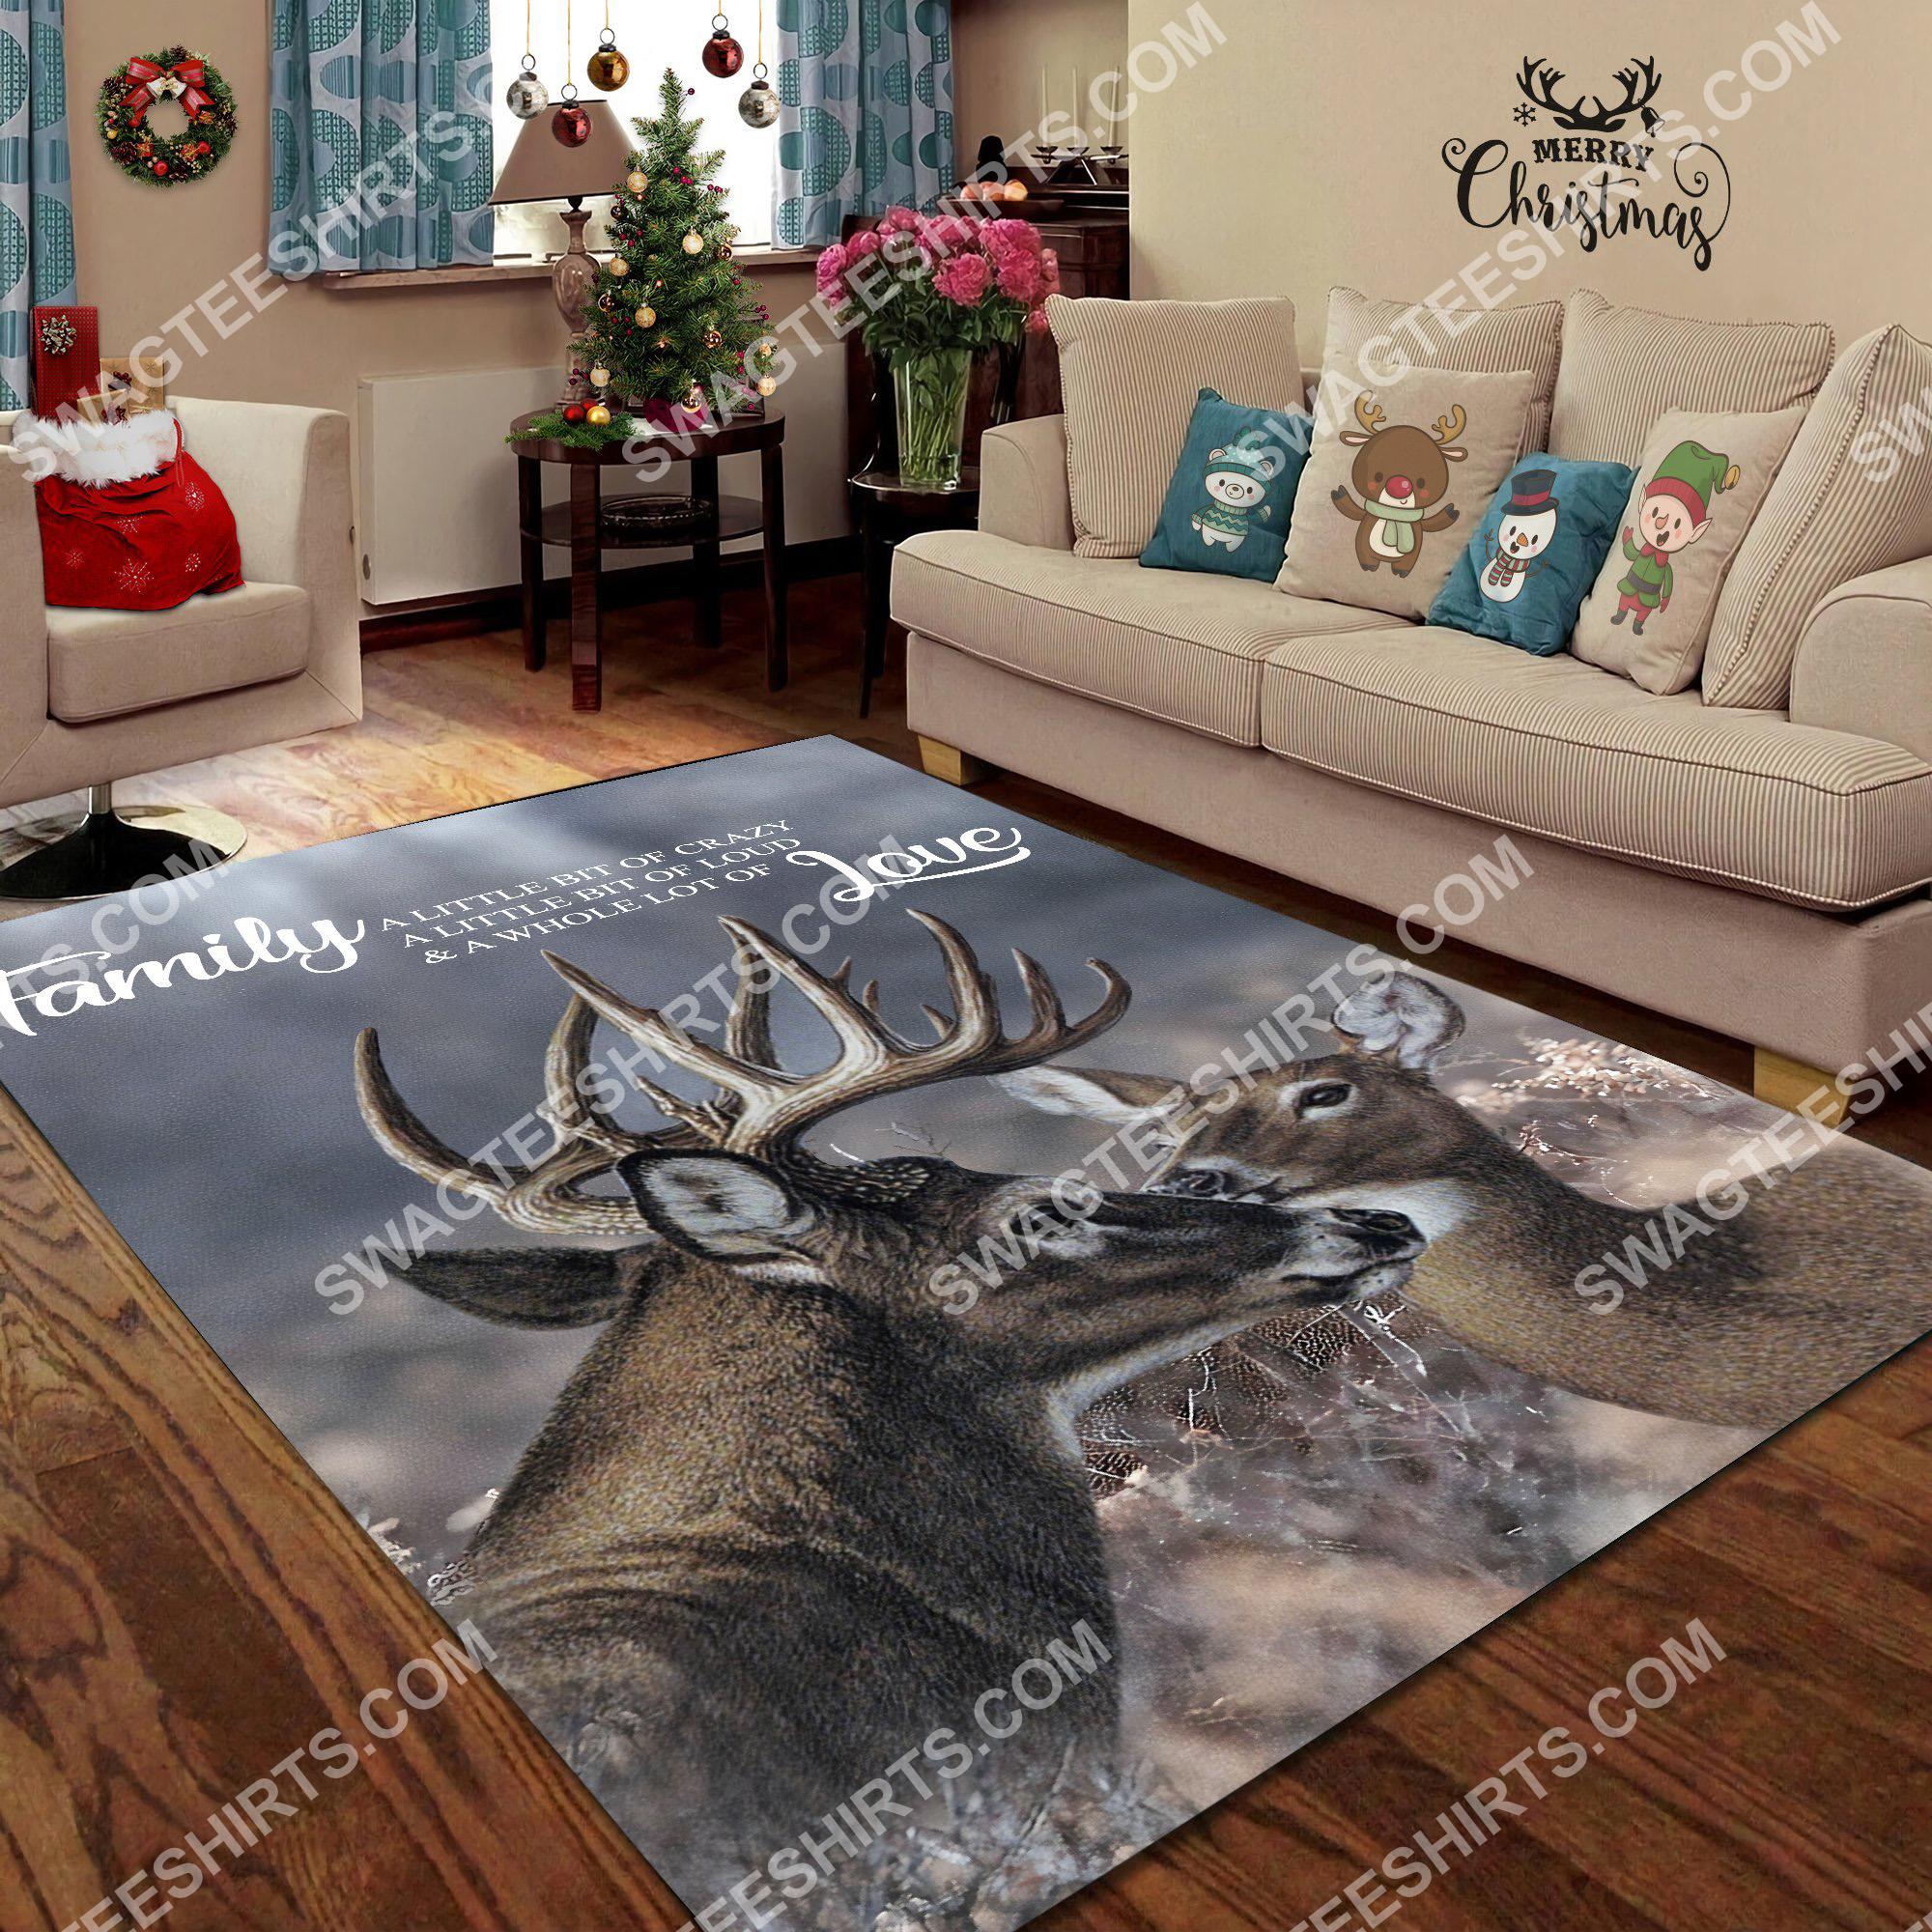 love deer family love all over printed rug 2(1)